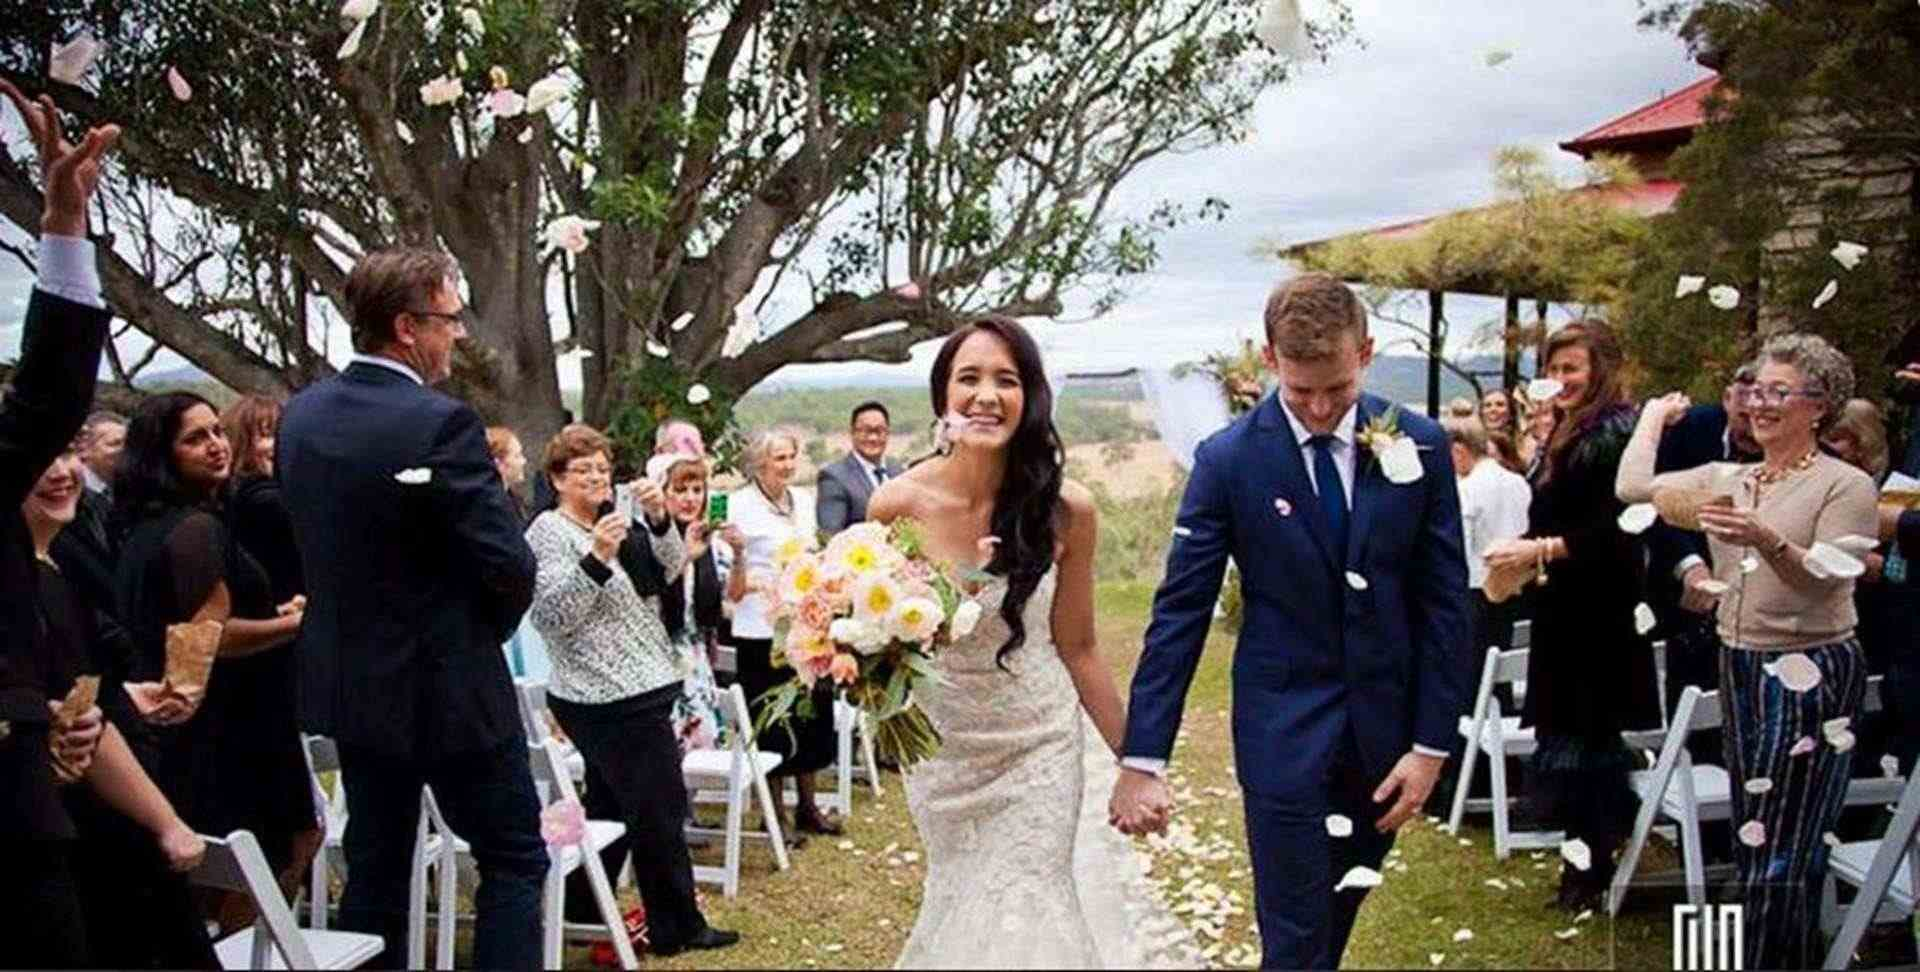 Wedding Venue - Spicers Hidden Vale 8 on Veilability